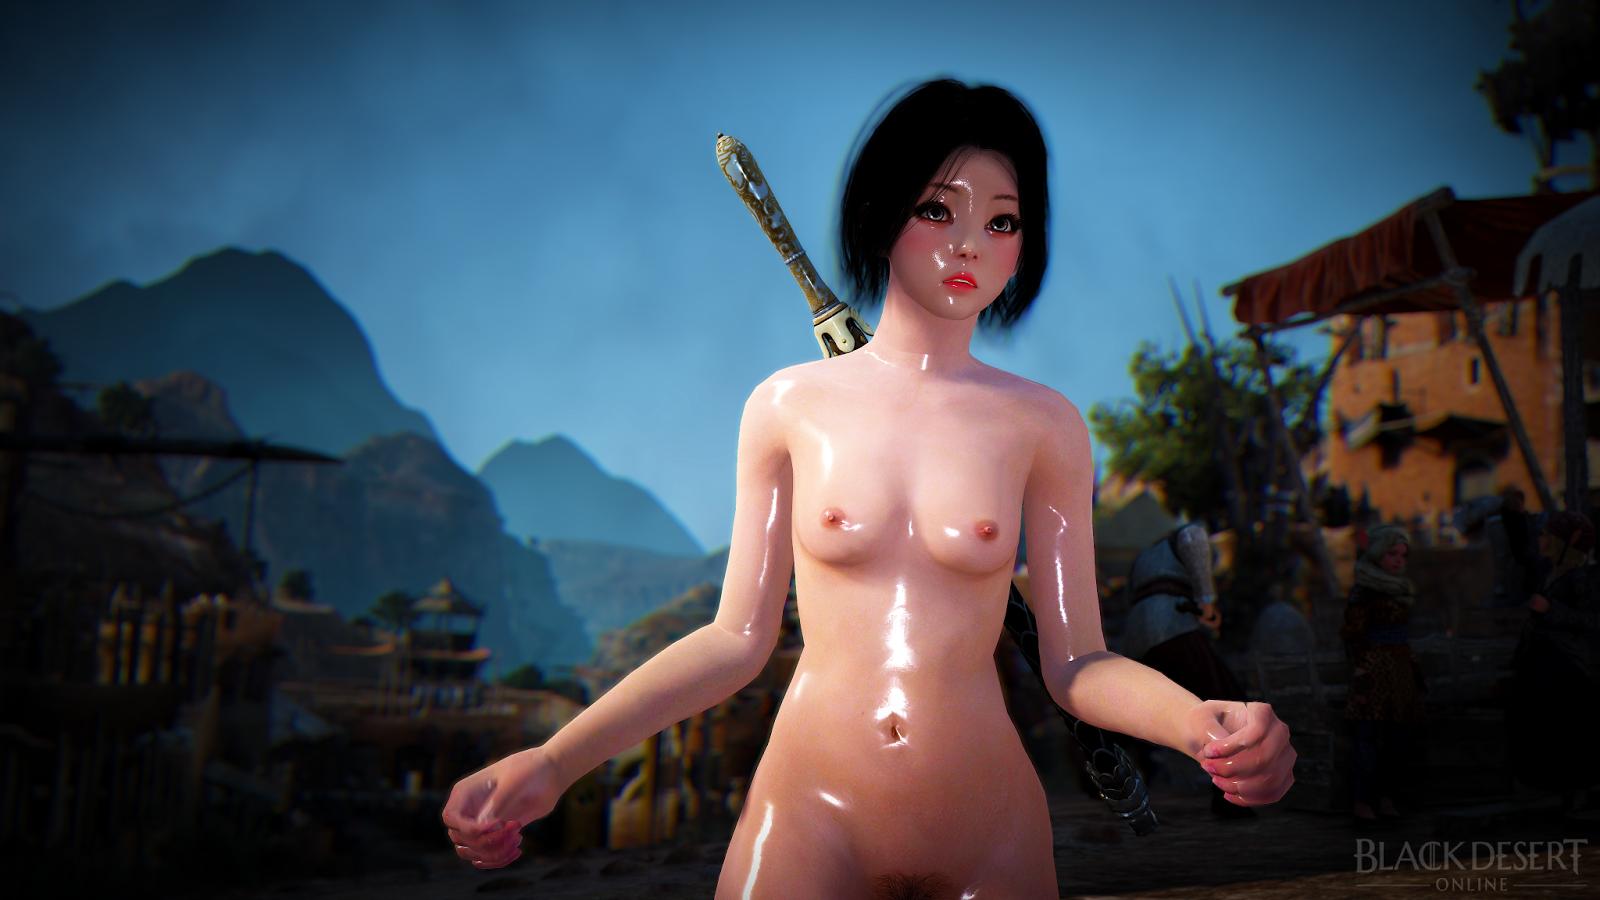 Naked Black Nudes